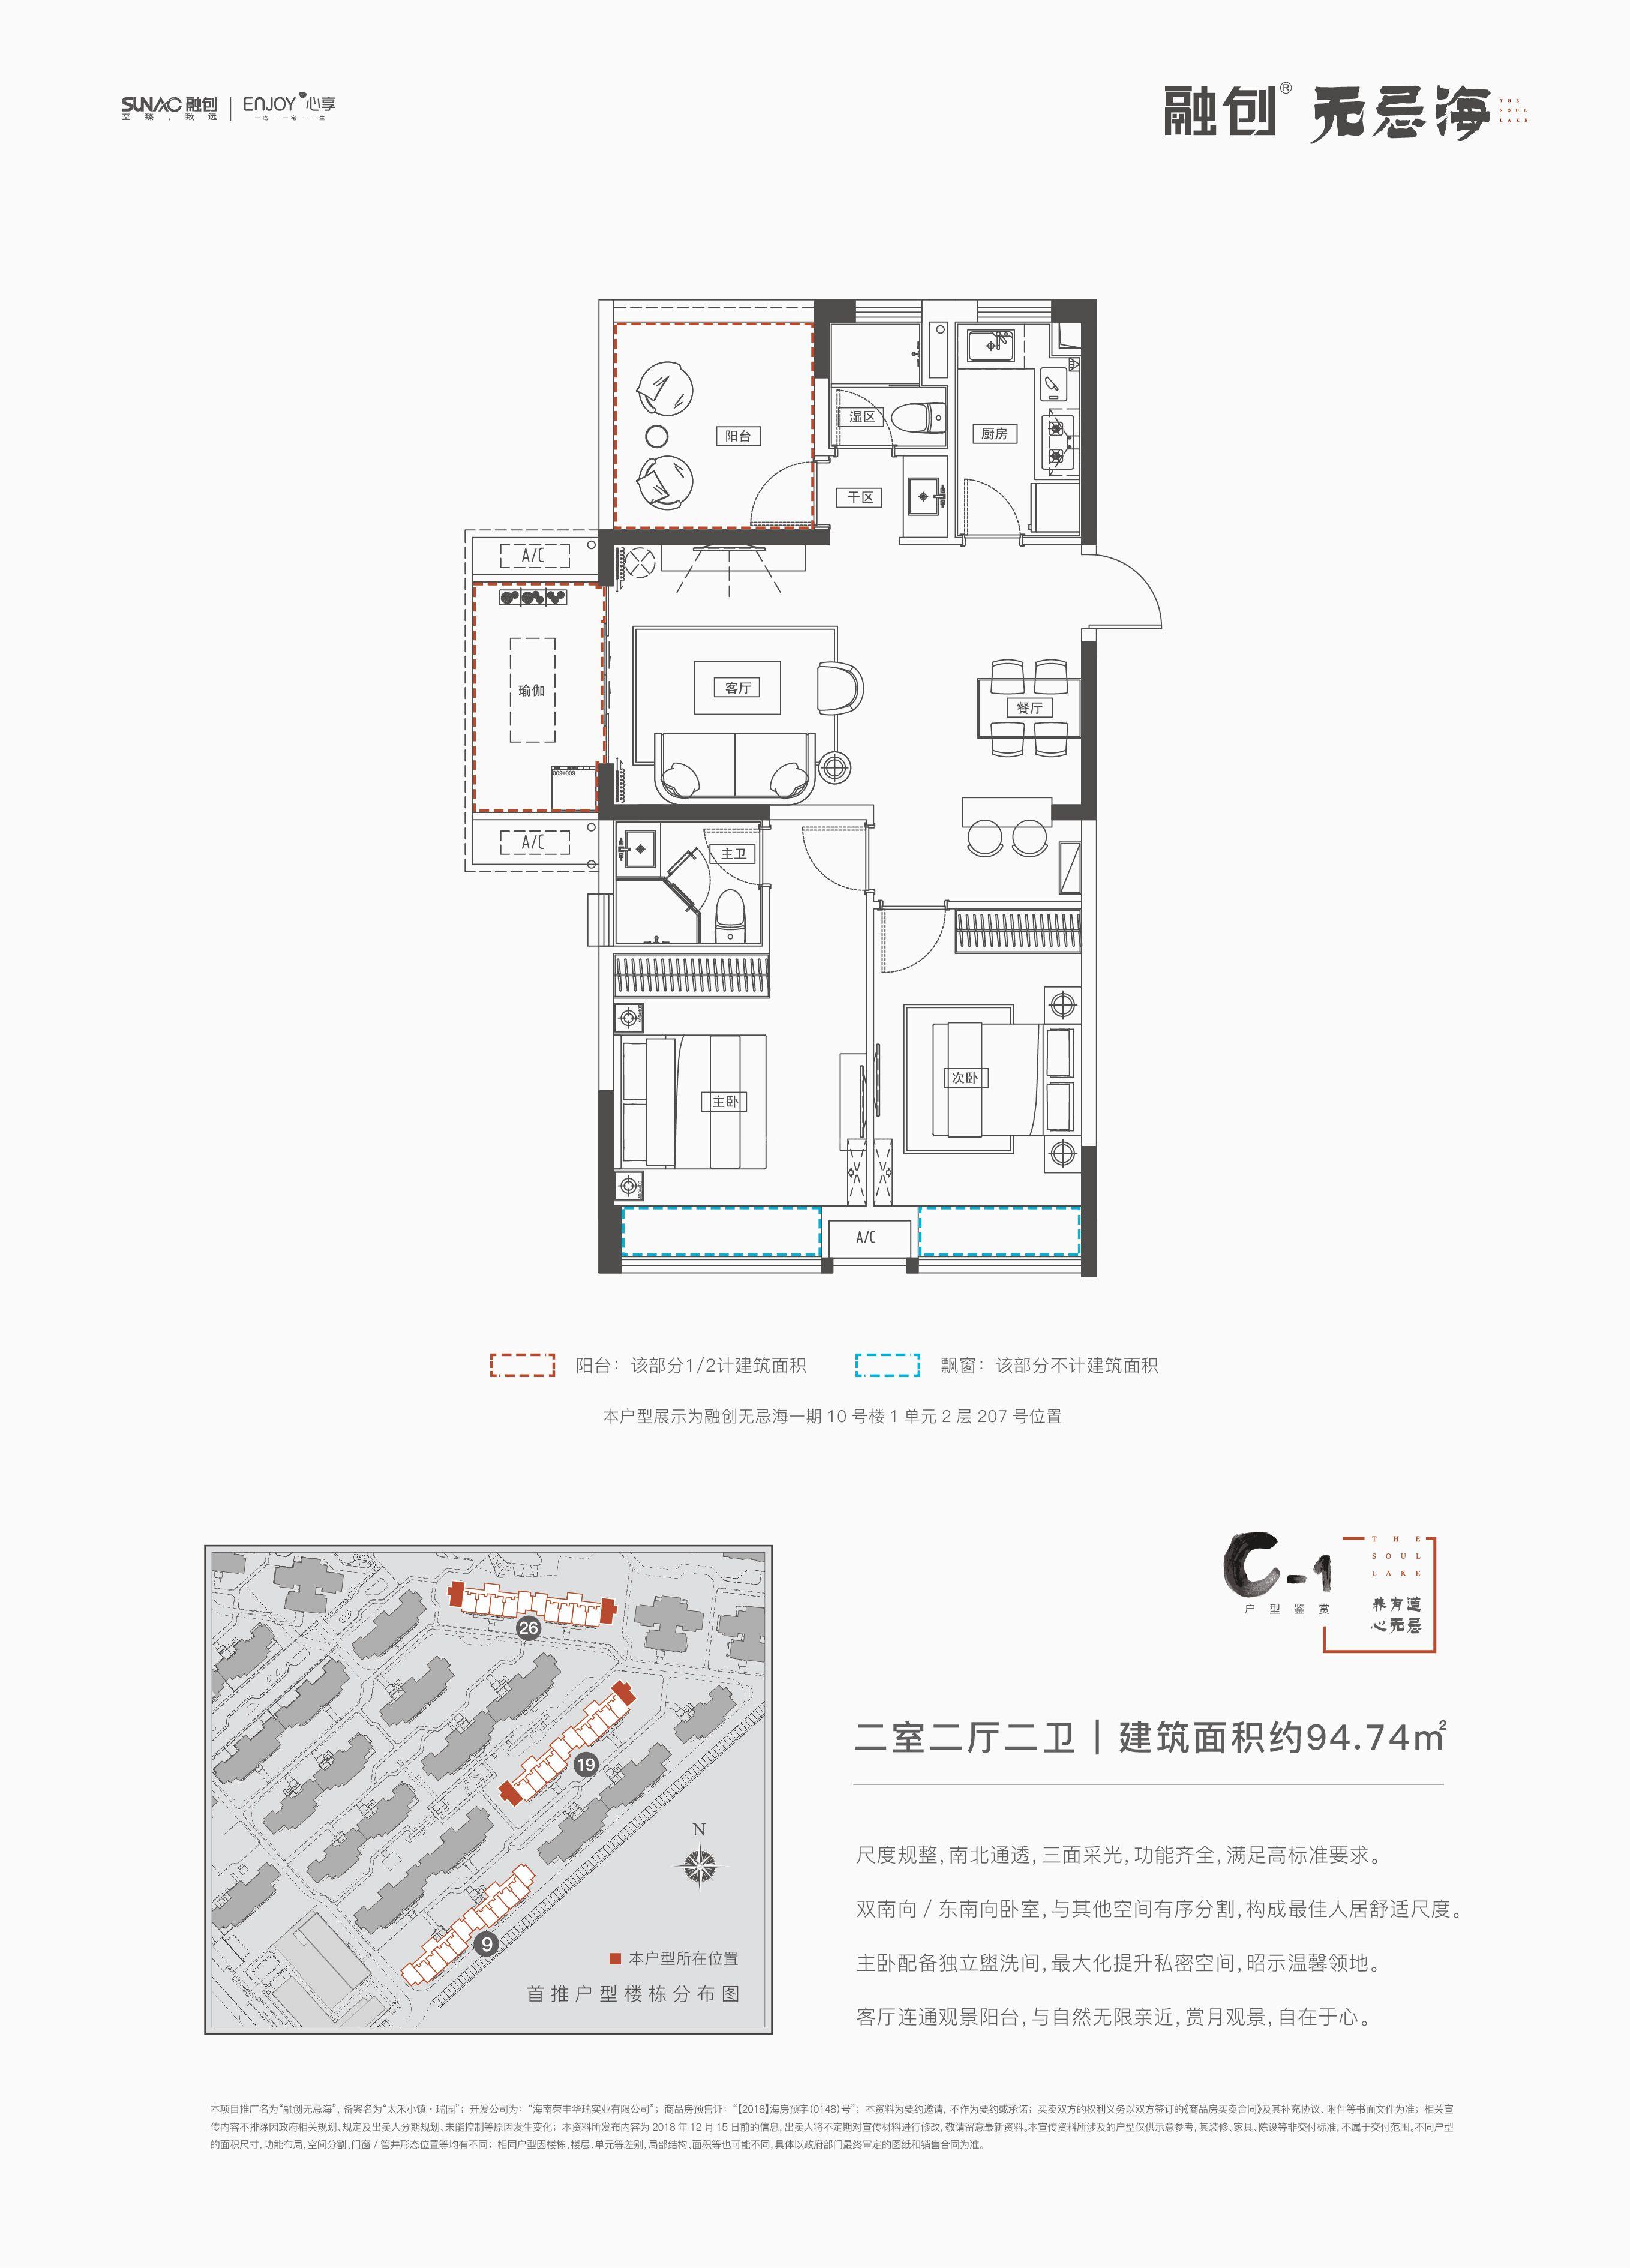 C-1 2房2厅2卫 建面94.74㎡